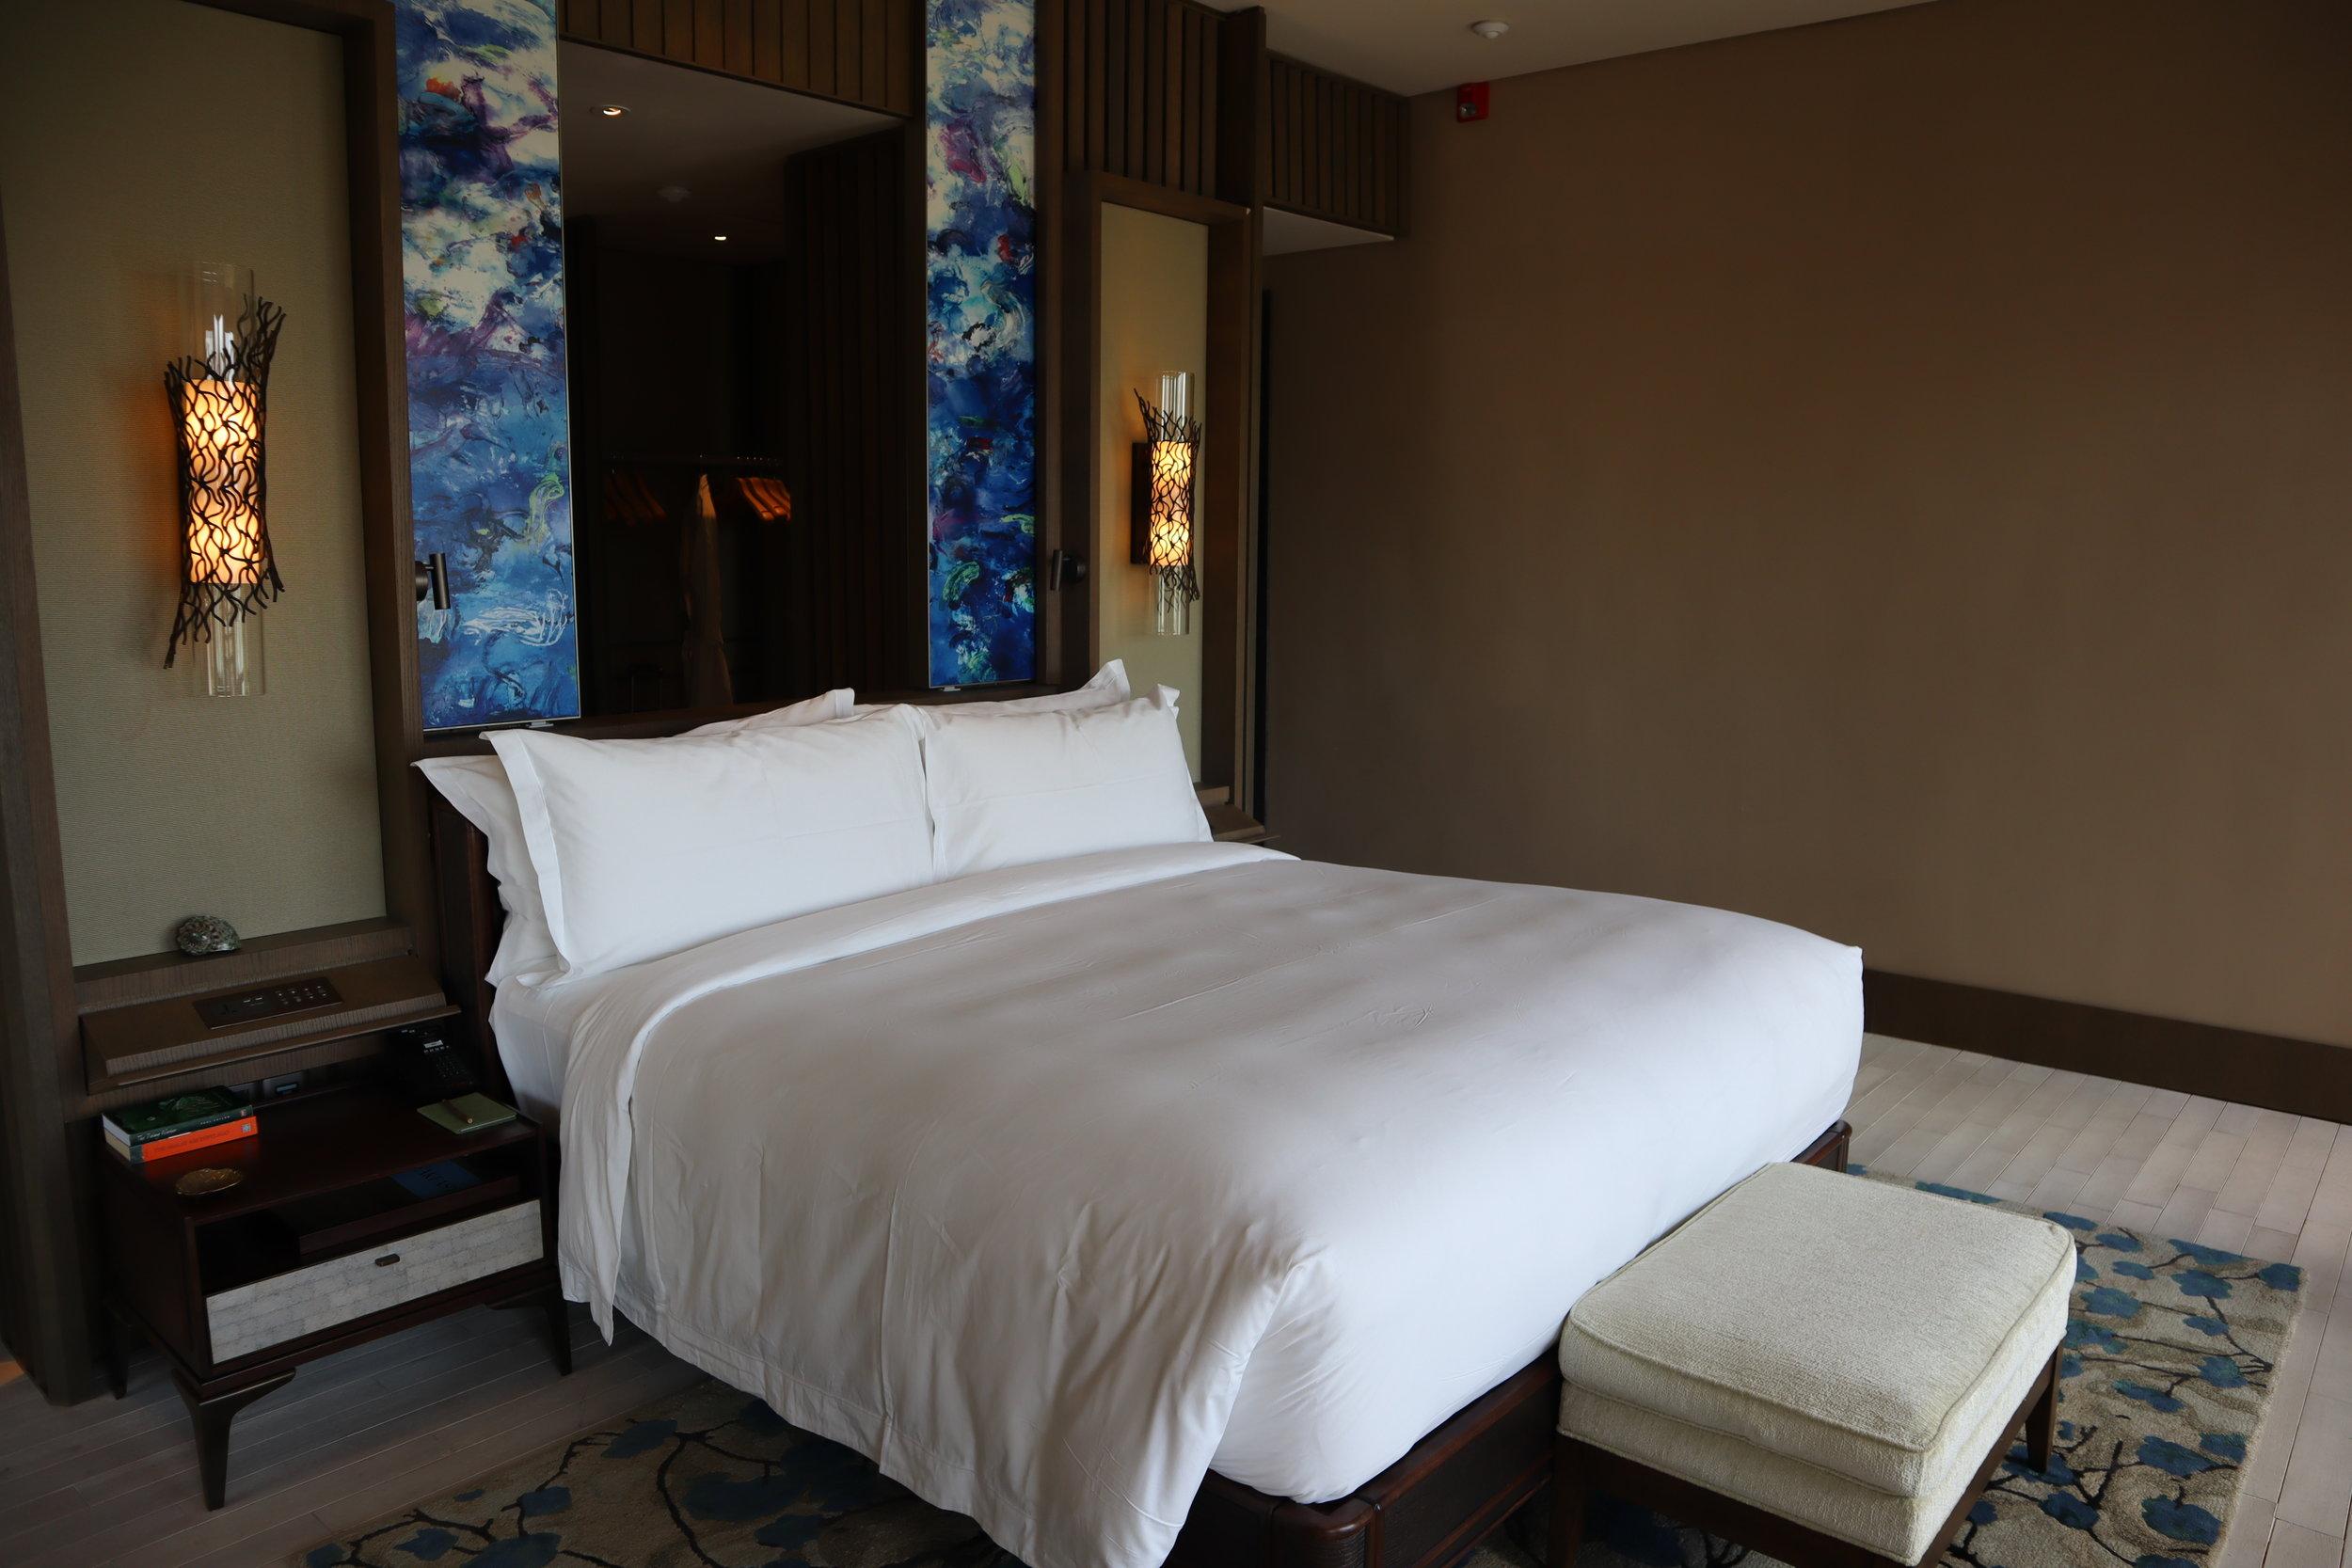 The Ritz-Carlton, Langkawi – Rainforest Junior Suite bedroom